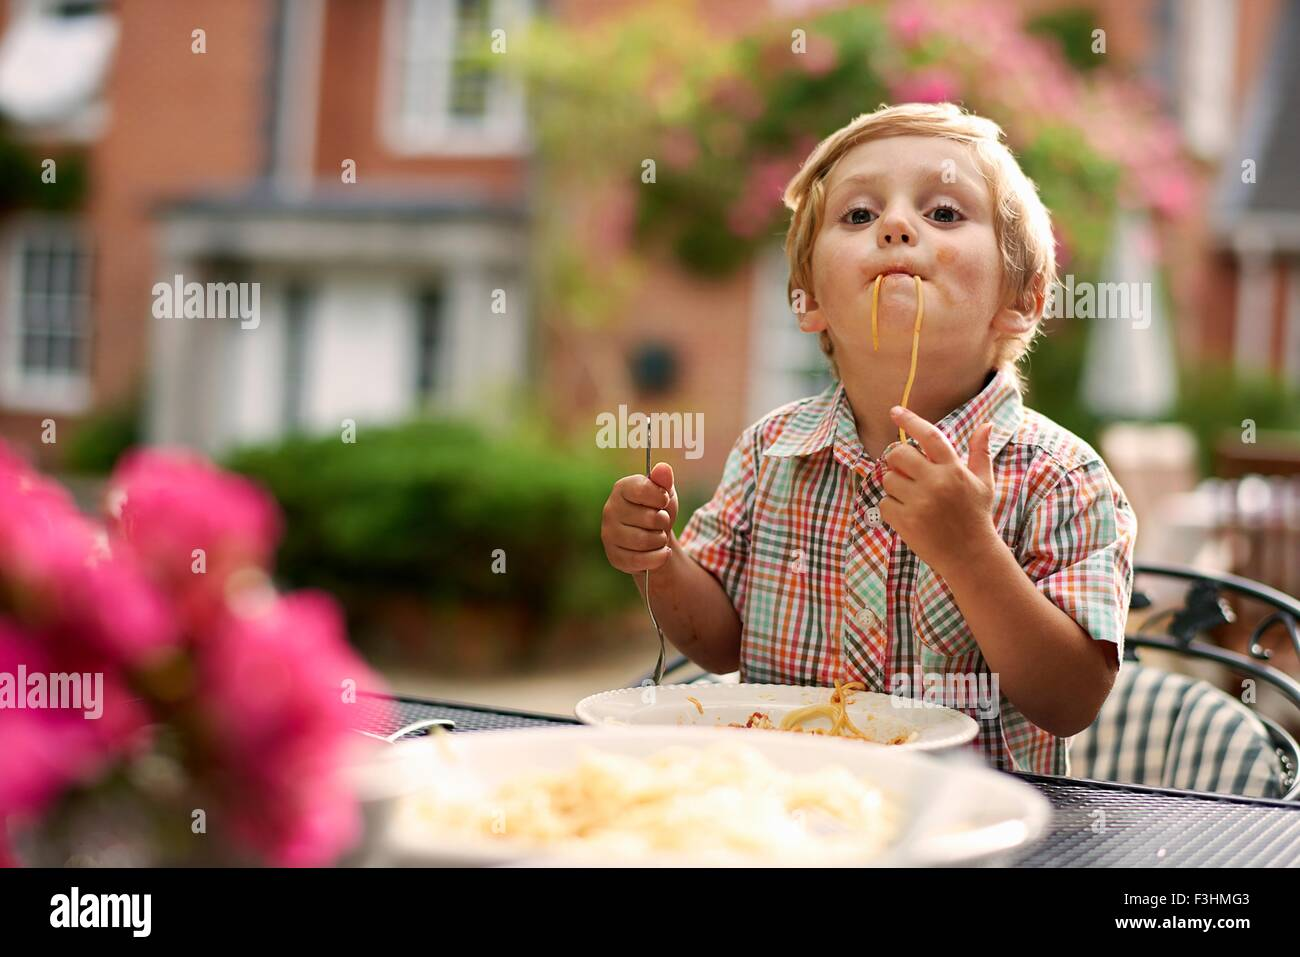 Garçon assis à table de jardin à aspirer des spaghettis looking at camera Photo Stock